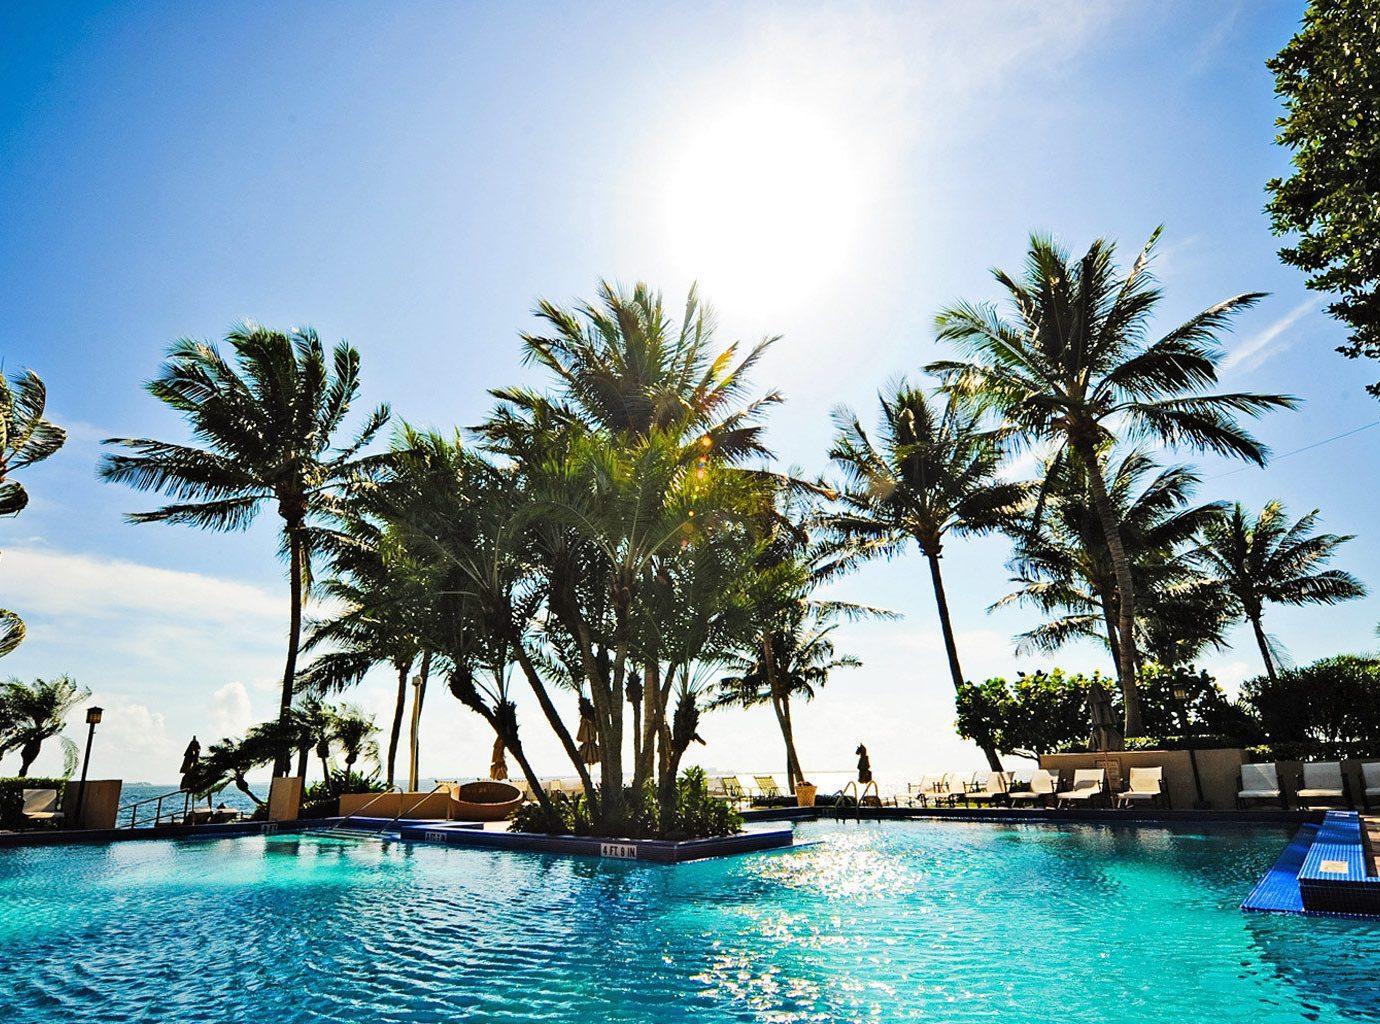 Patio Pool Tropical tree water sky Boat Resort swimming pool leisure caribbean palm arecales Ocean tropics blue Lagoon Sea swimming lined empty